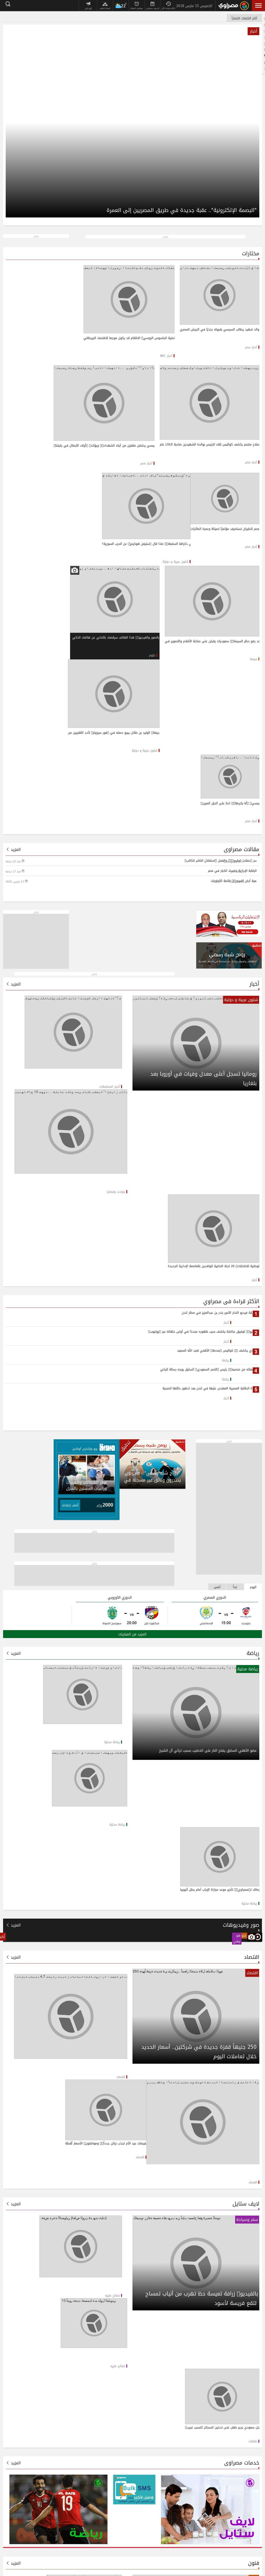 Masrawy at Thursday March 15, 2018, 12:08 p.m. UTC